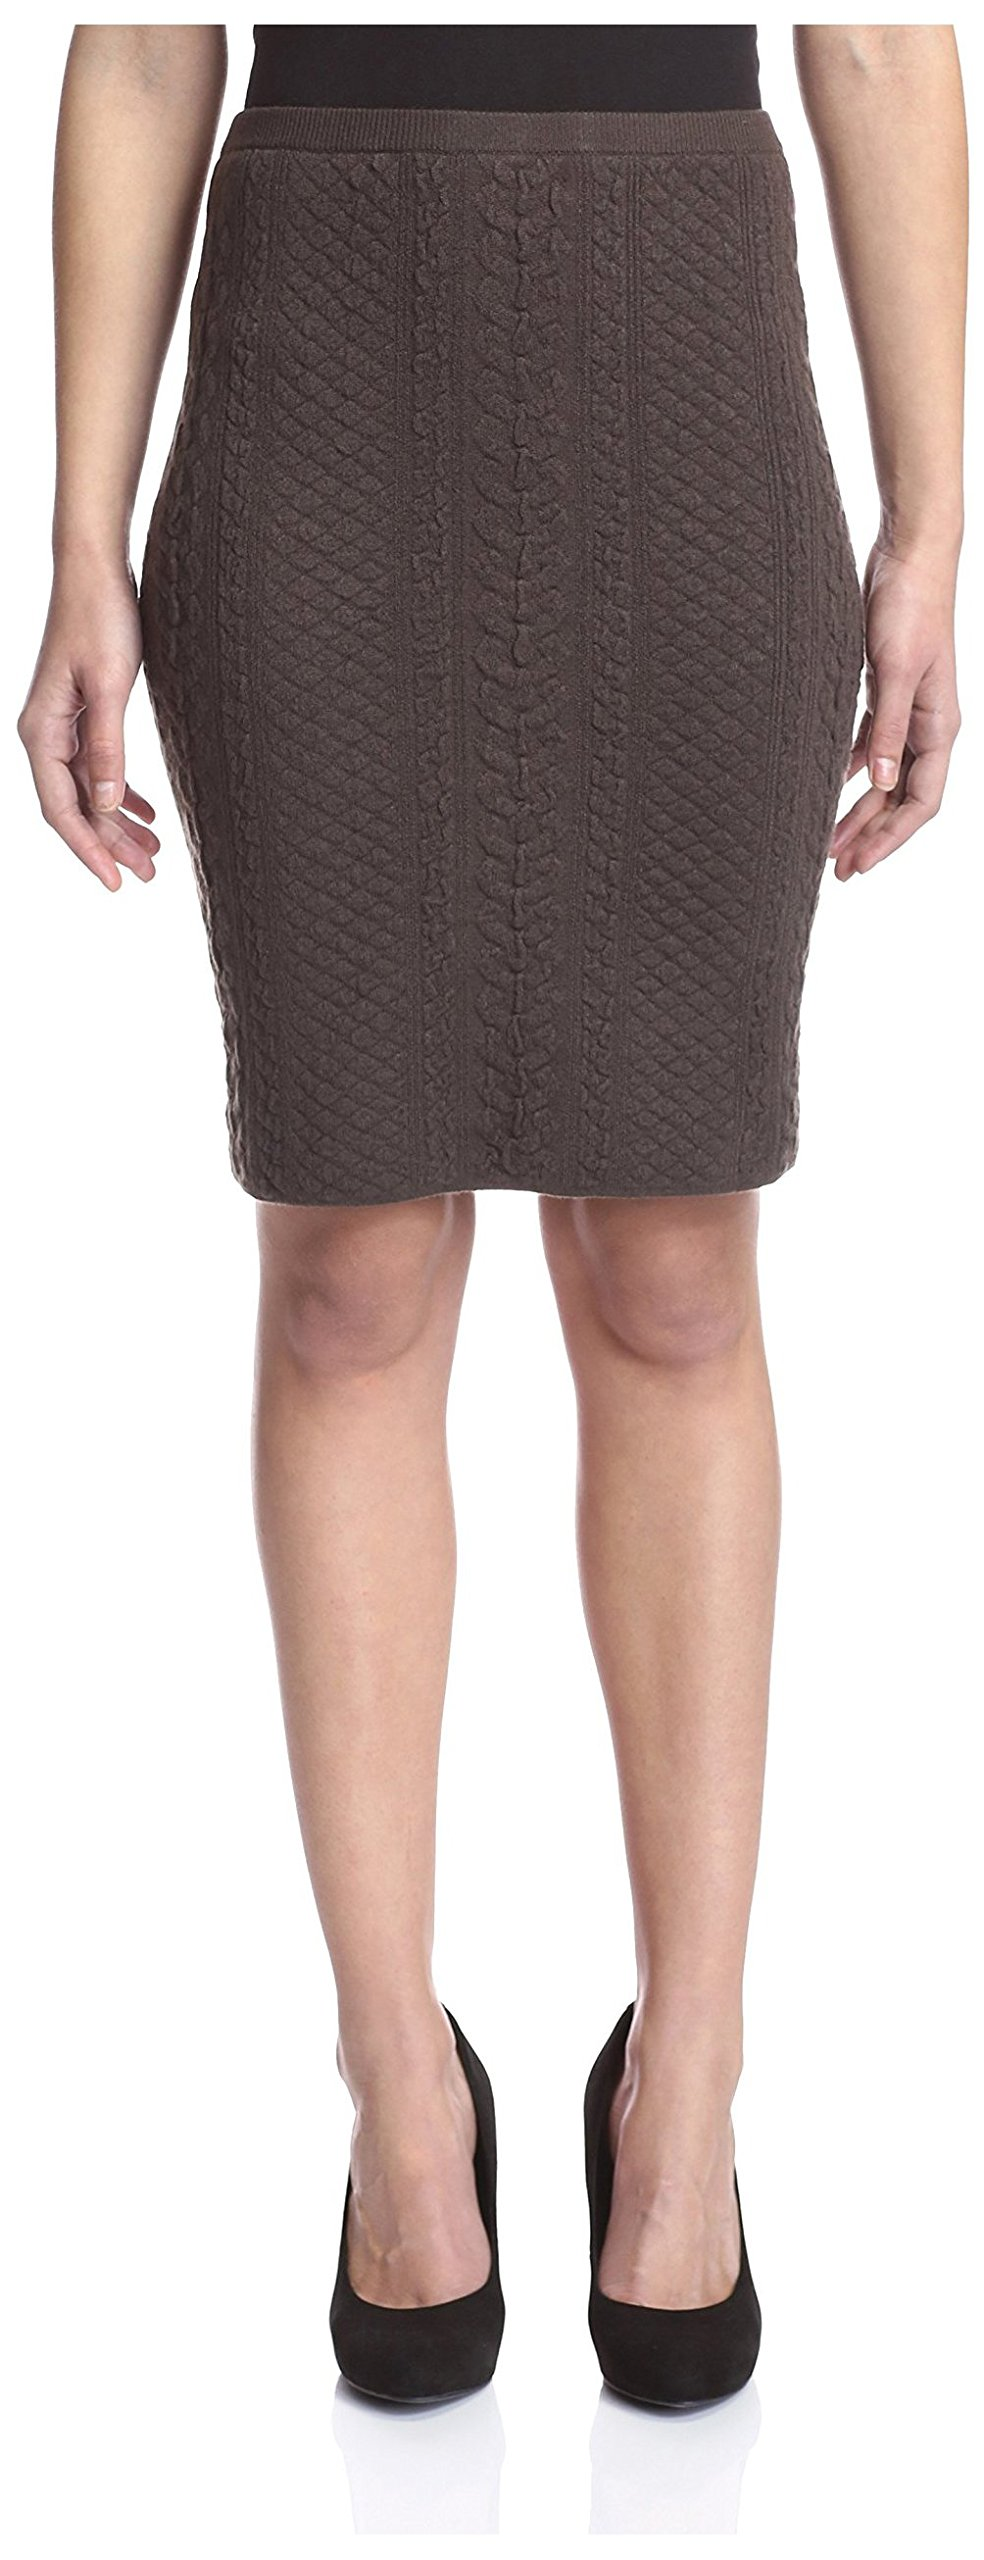 Natori Women's Knit Pencil Skirt, Stone, L by Natori